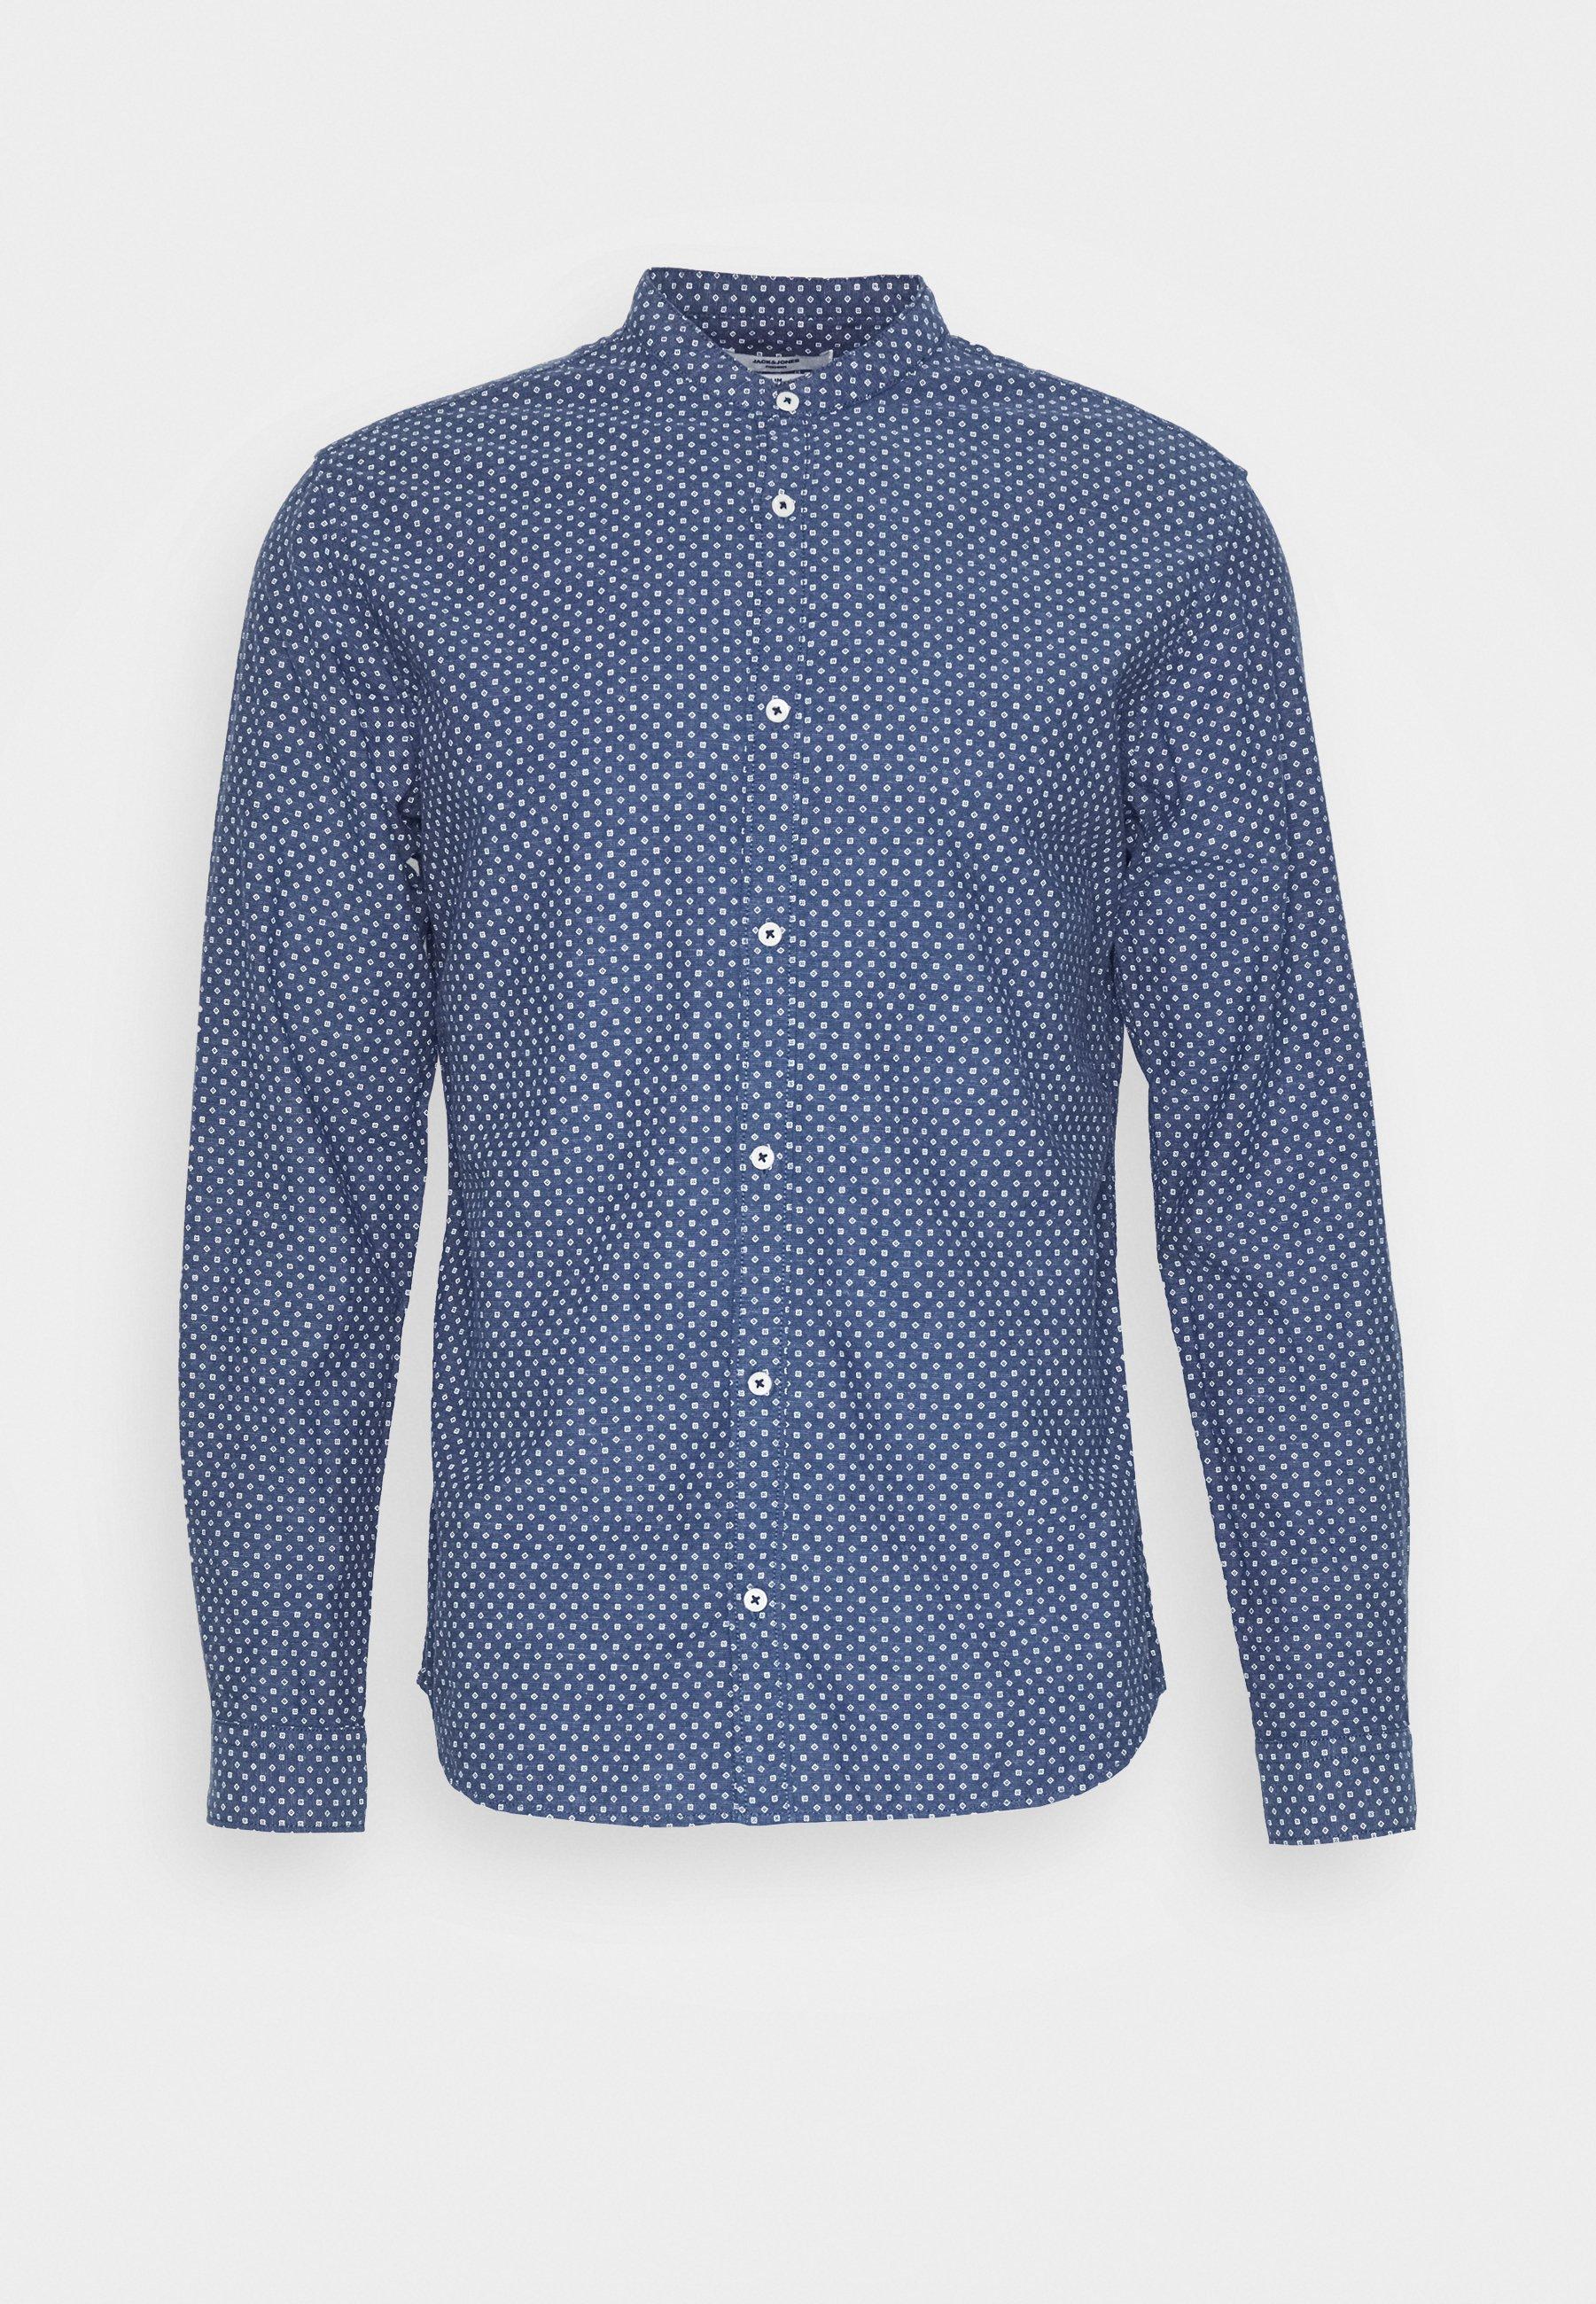 Jack & Jones PREMIUM JPRBLASUMMER BAND PRINT SHIRT - Koszula - navy blazer